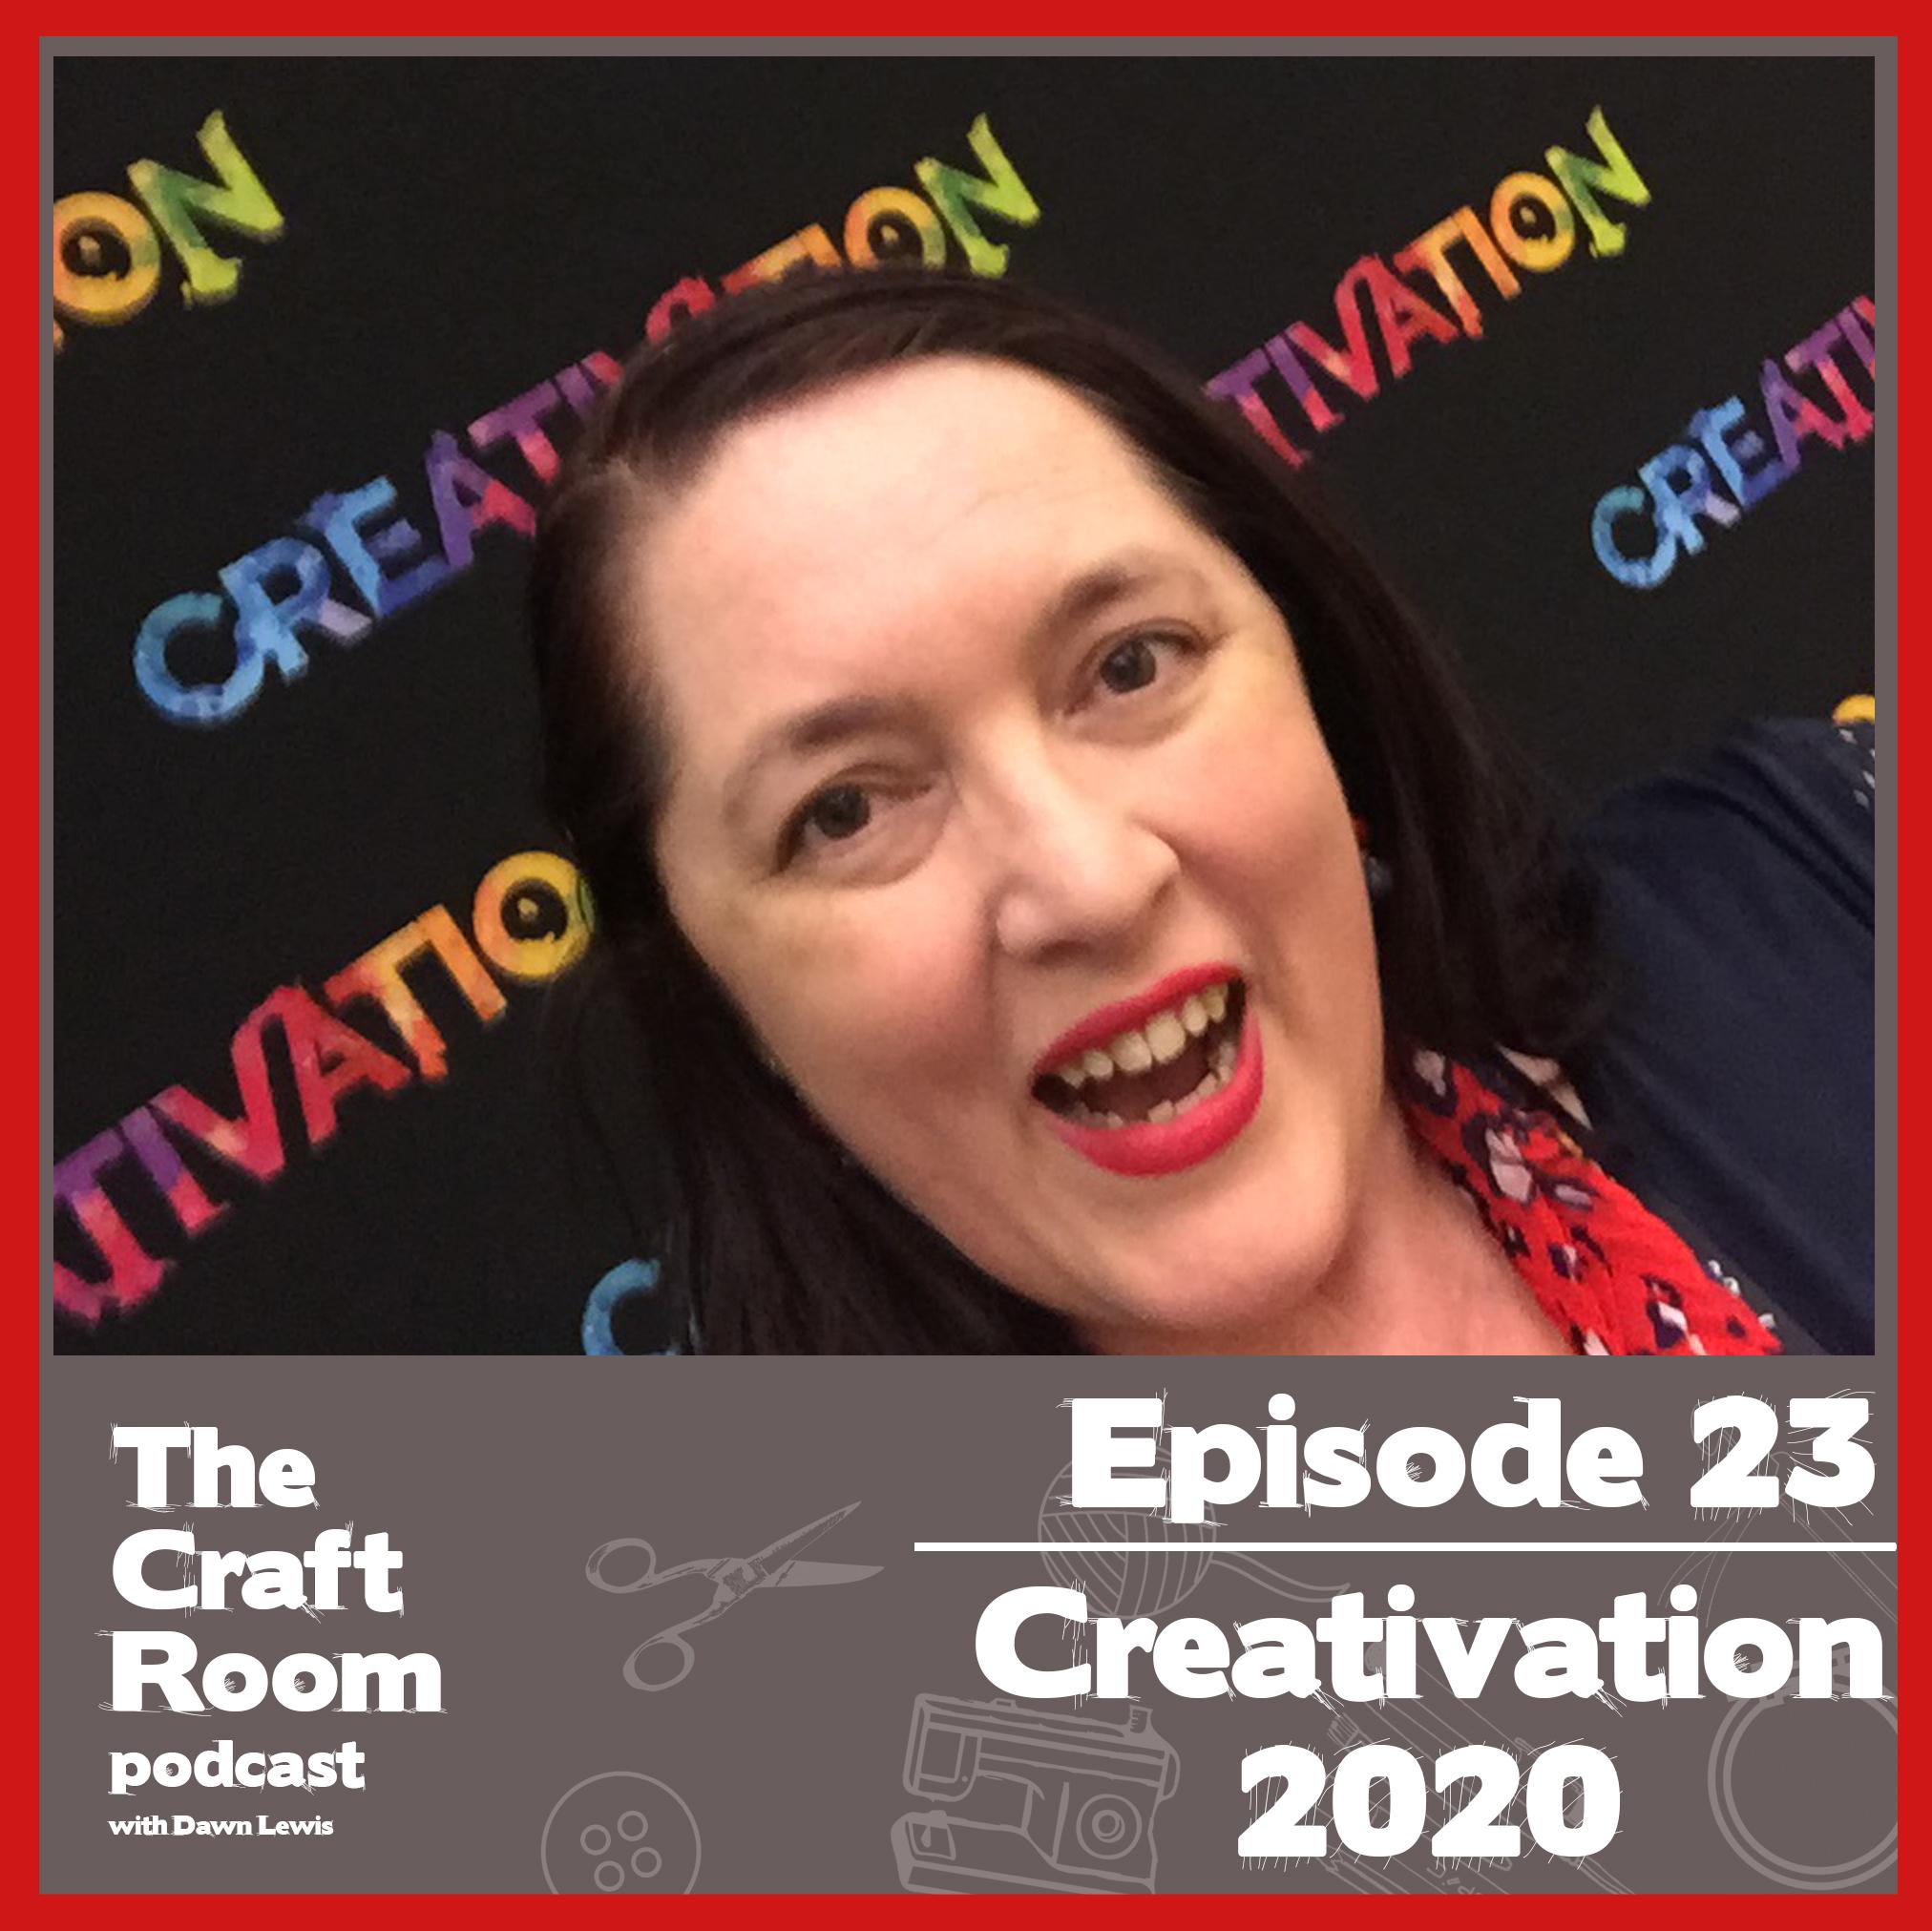 Episode 23 Creativation 2020